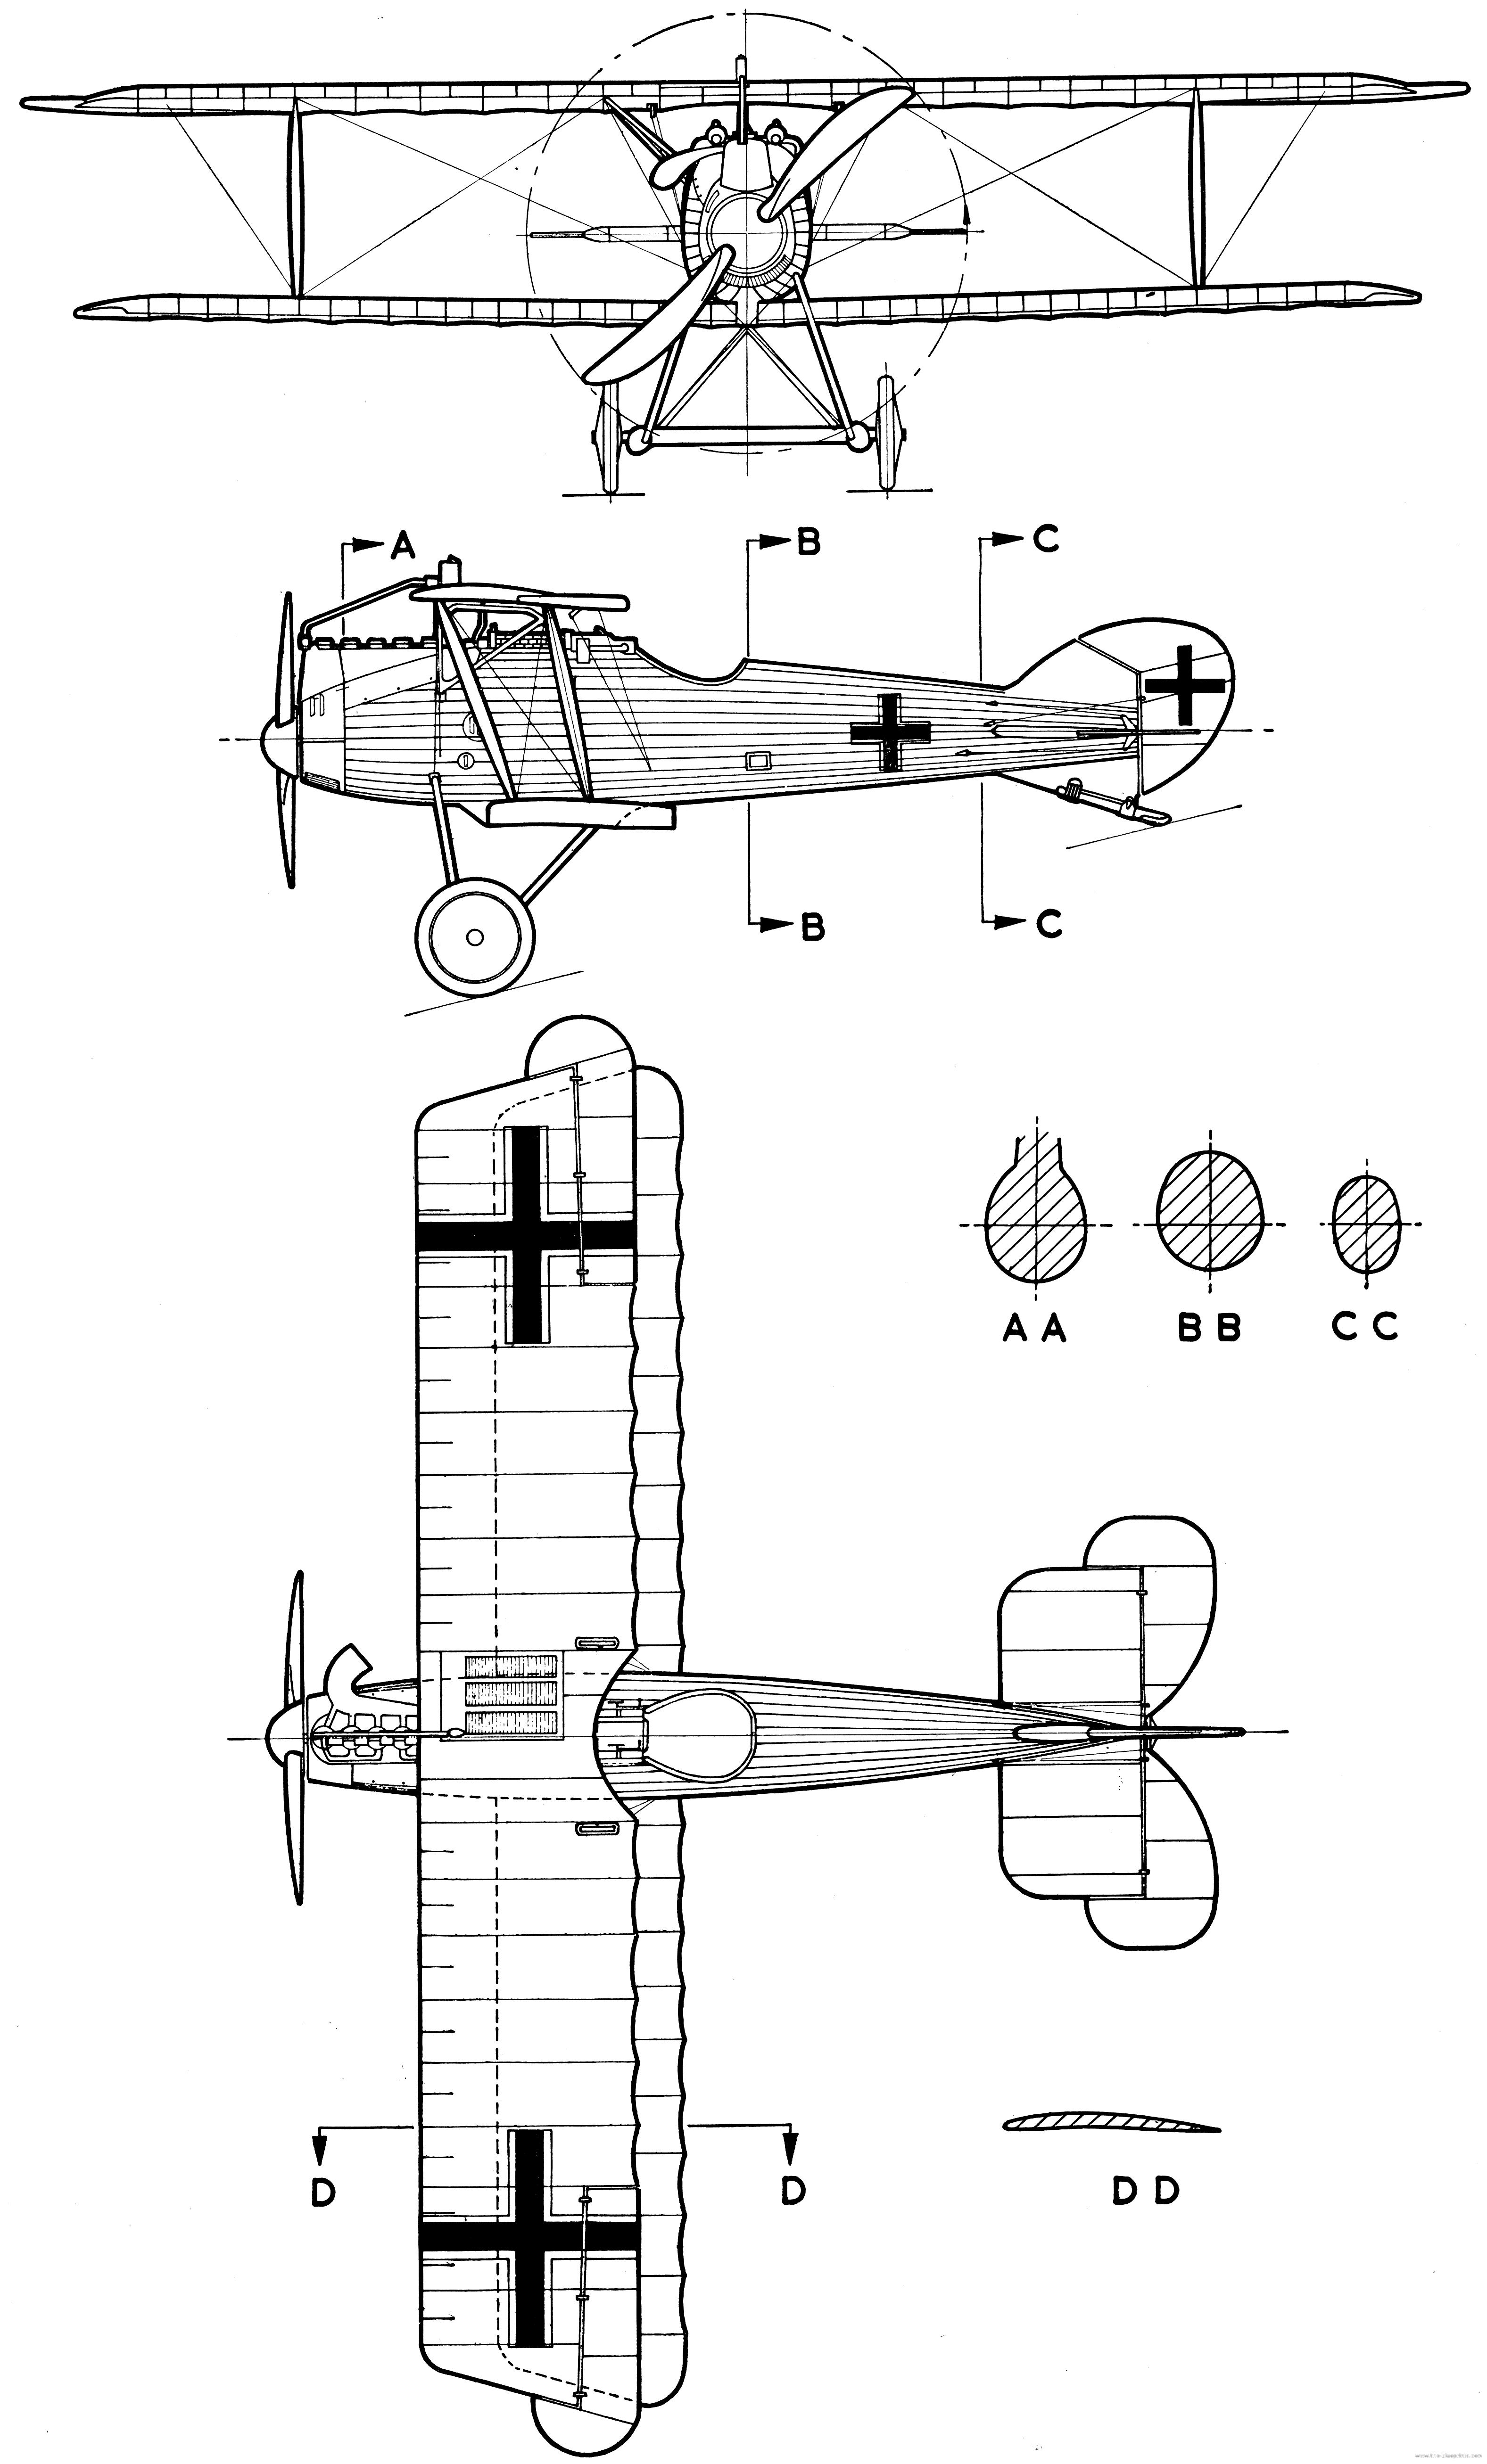 Pin By Timothy Klanderud On Blueprints